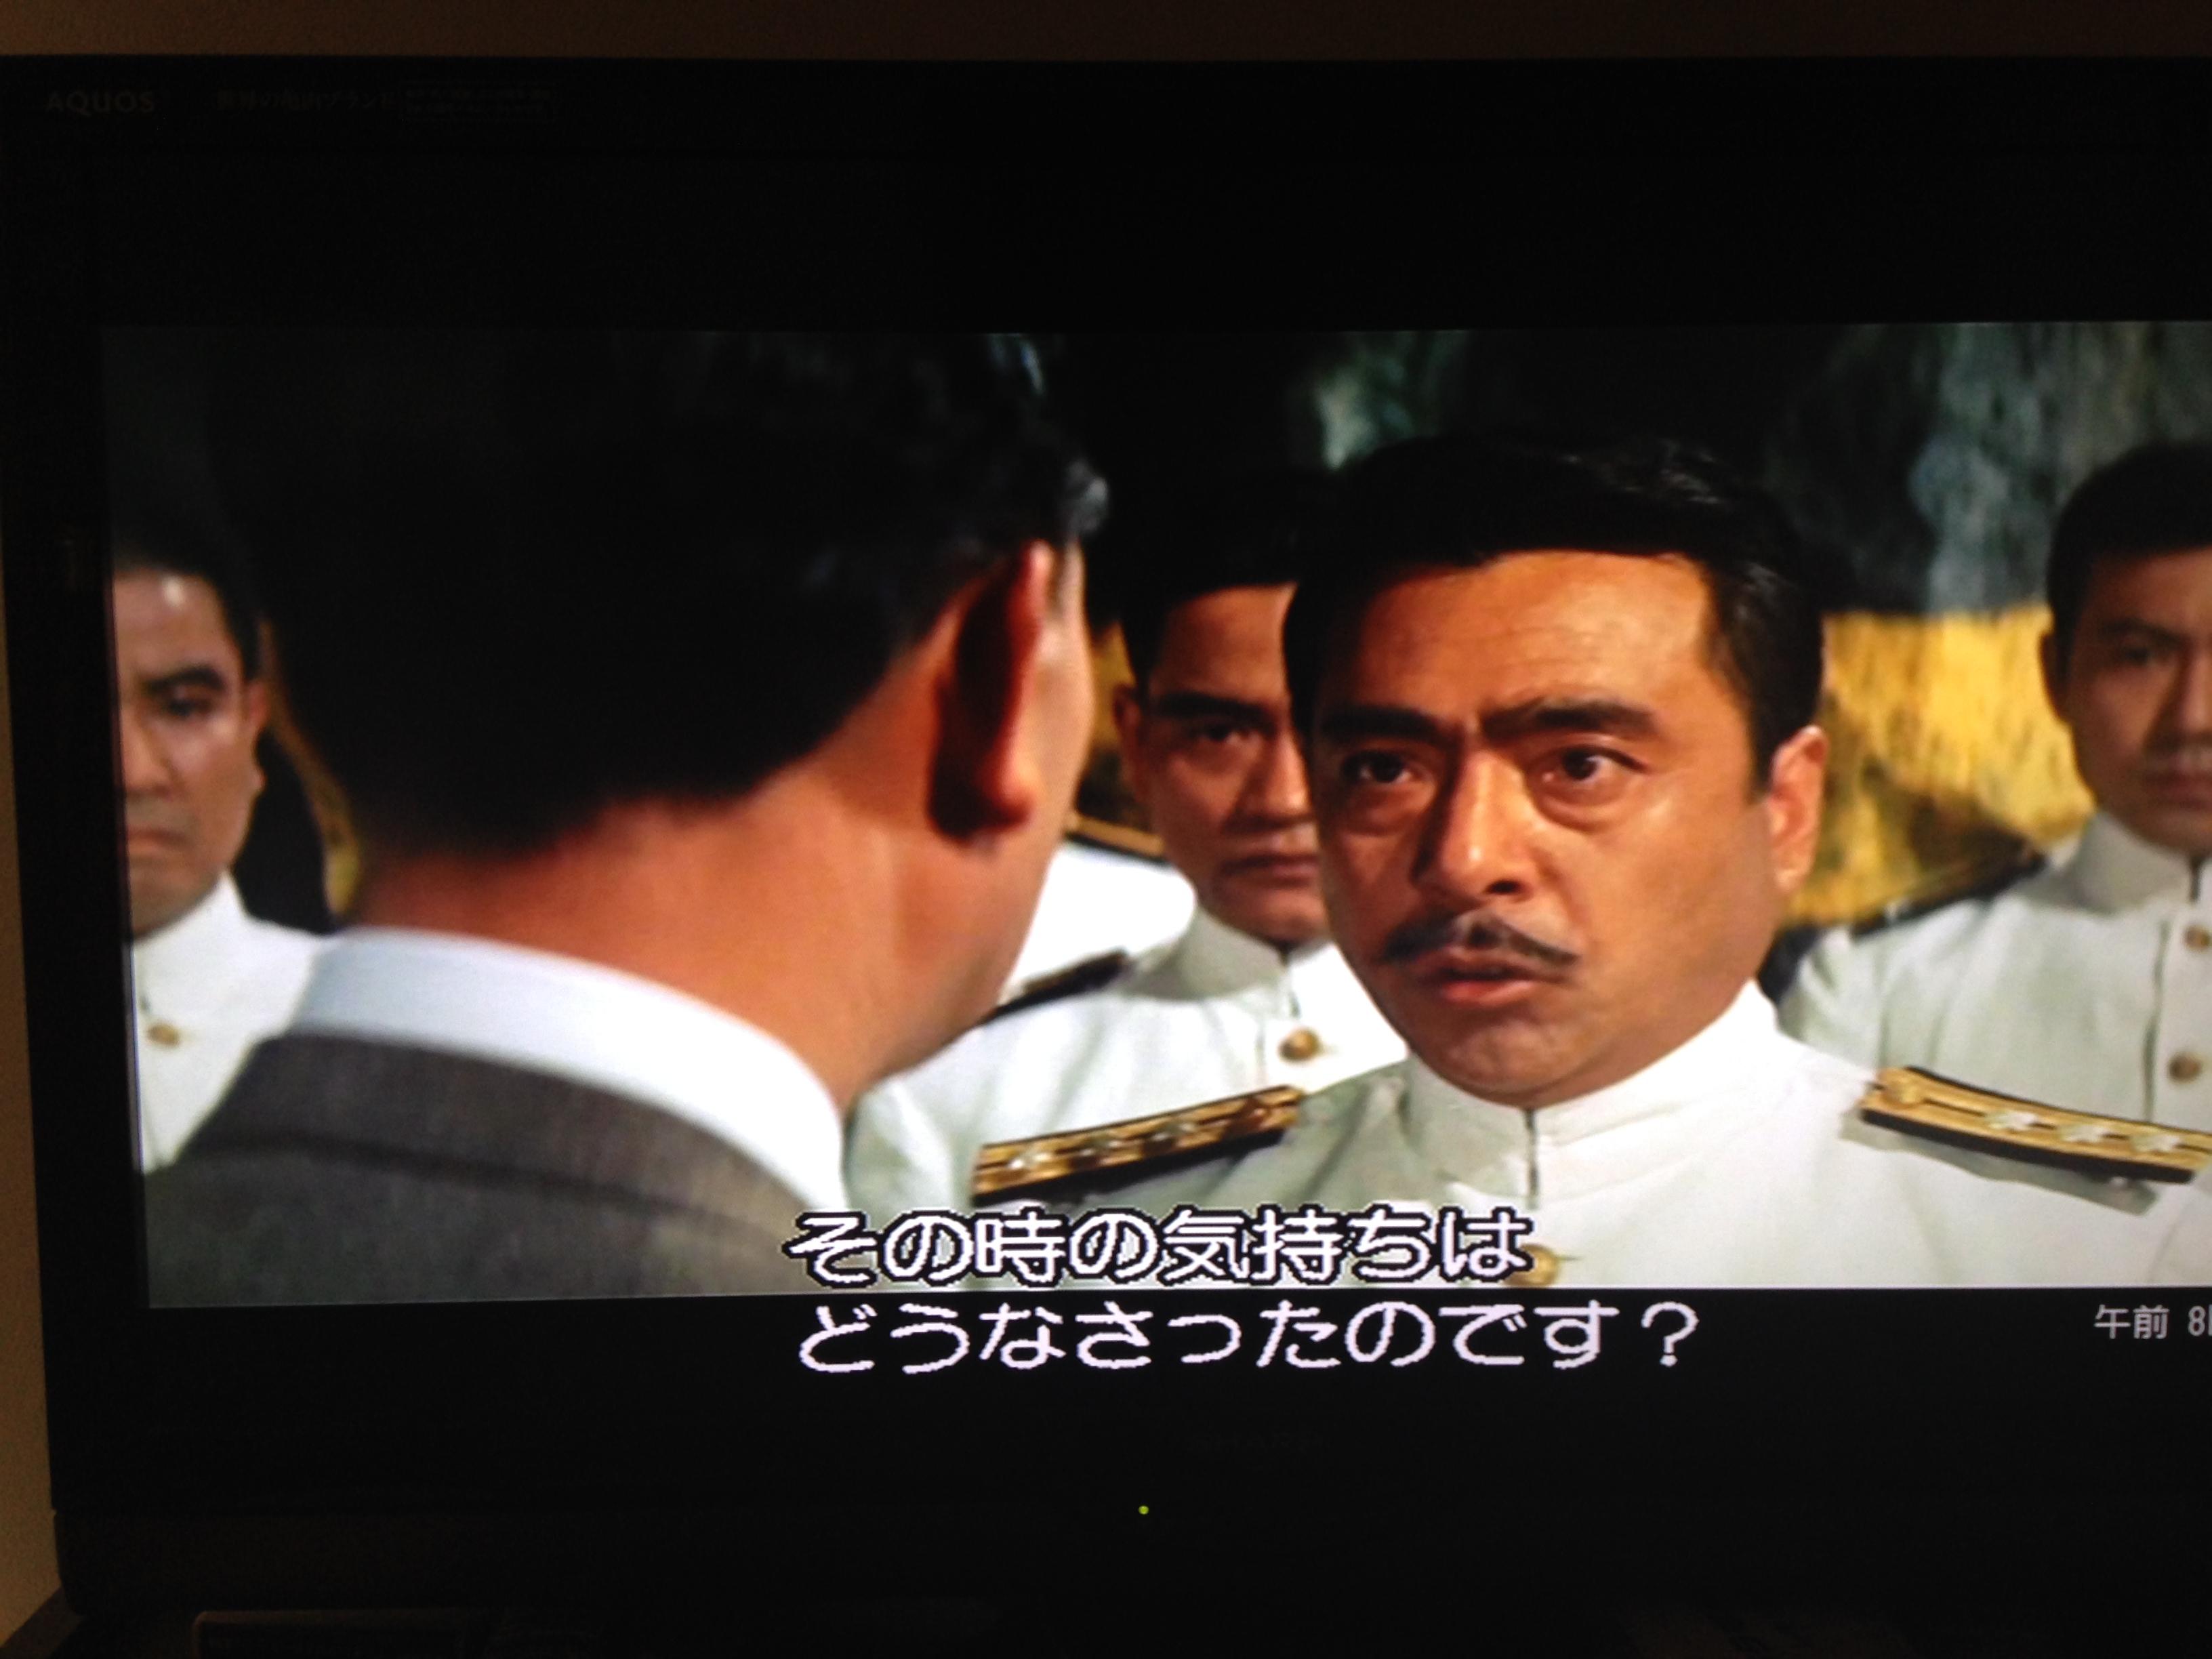 kimotiIMG_4772.jpg